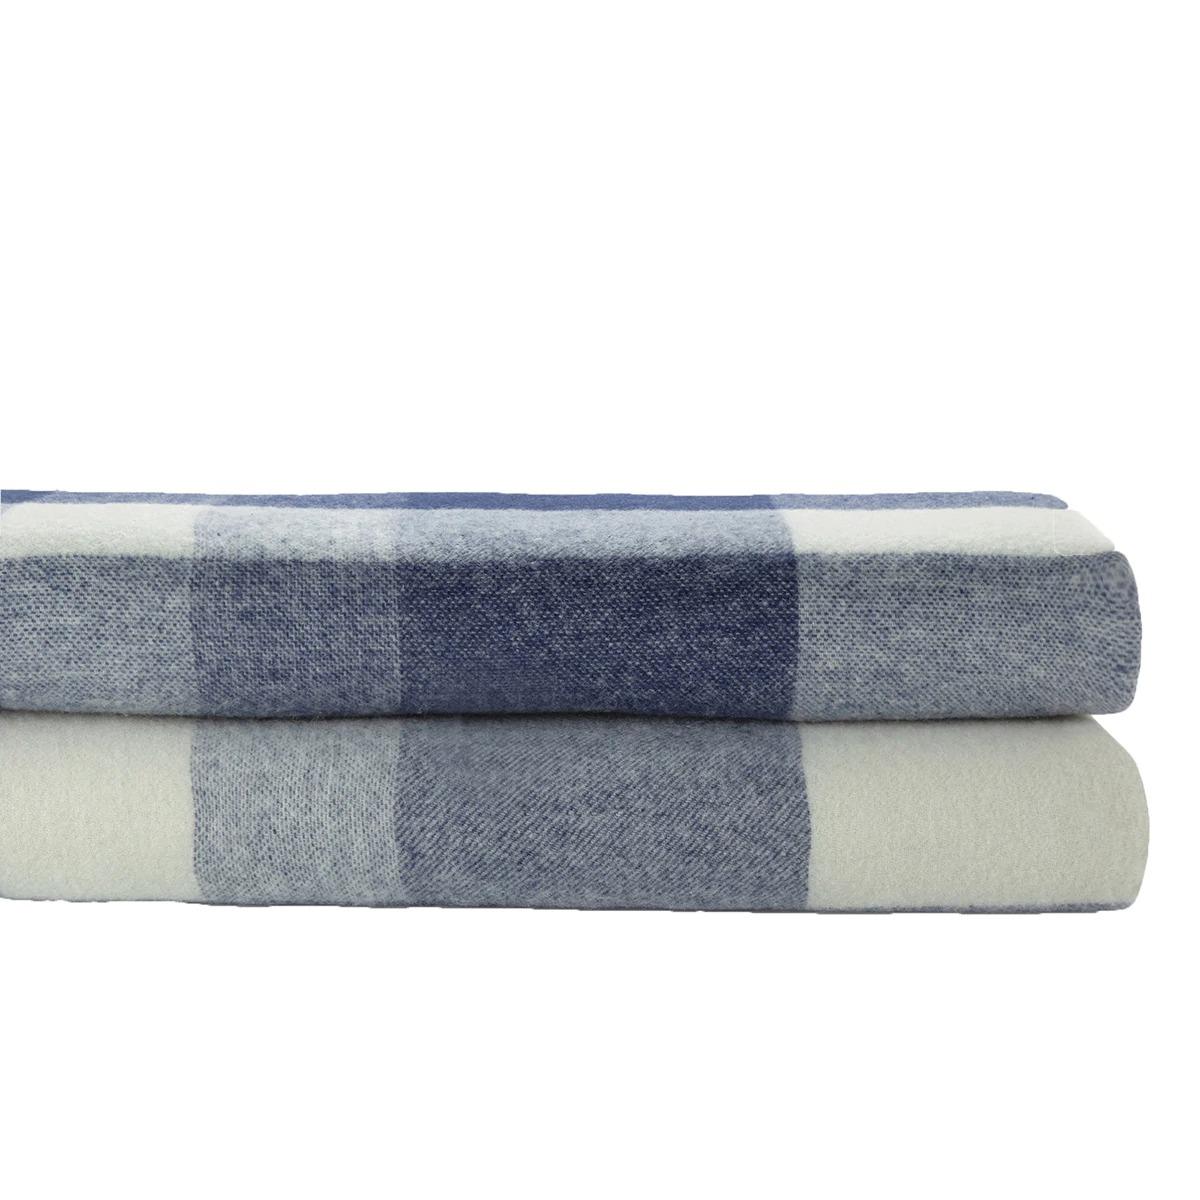 Manta decorativa de lana merino Madison El Corte Inglés